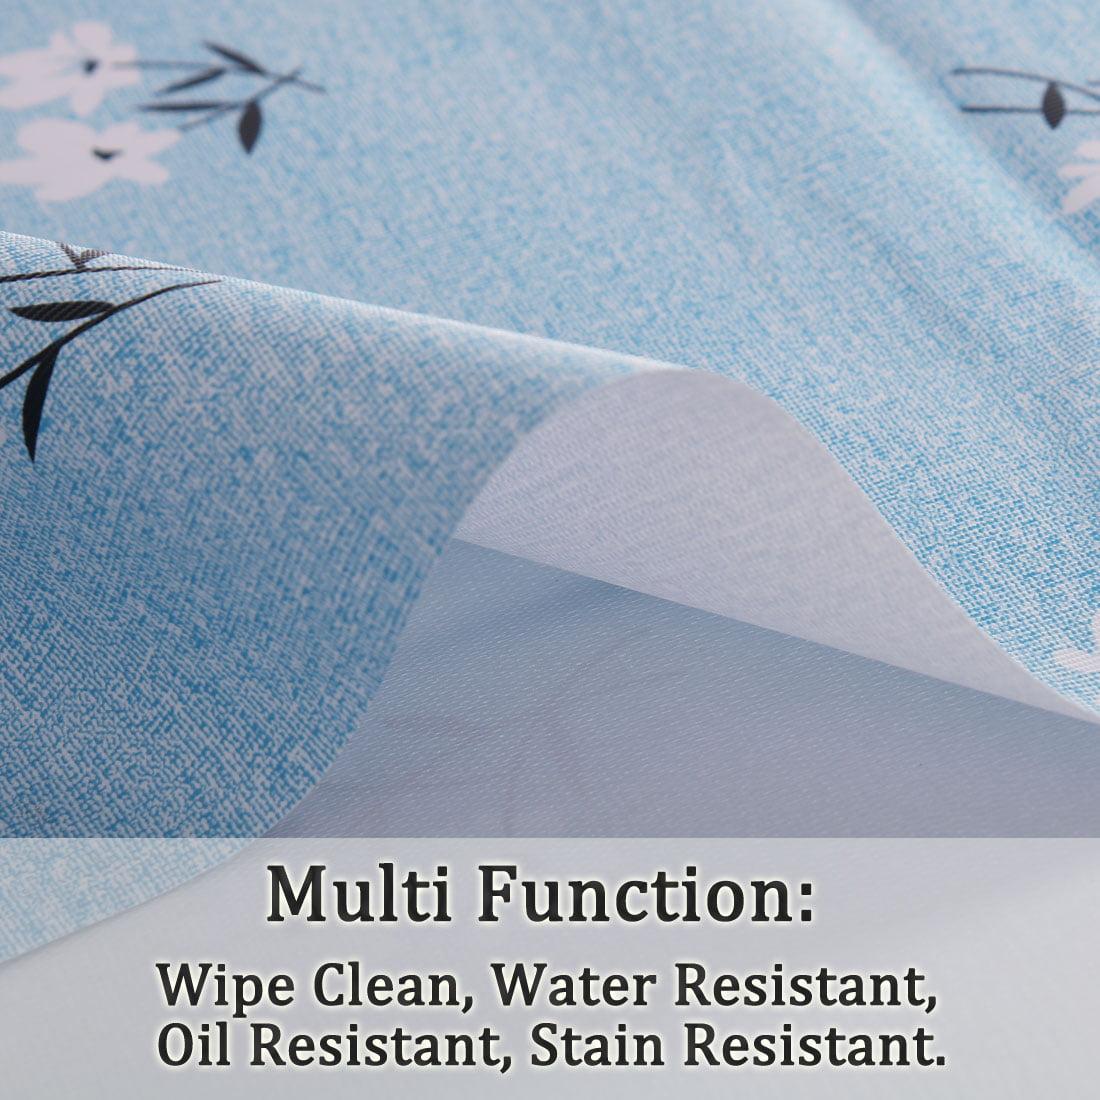 "Tablecloth PVC Vinyl Table Cover Oil Water Resistant Table Cloth 54"" x 79"", #4 - image 1 de 7"